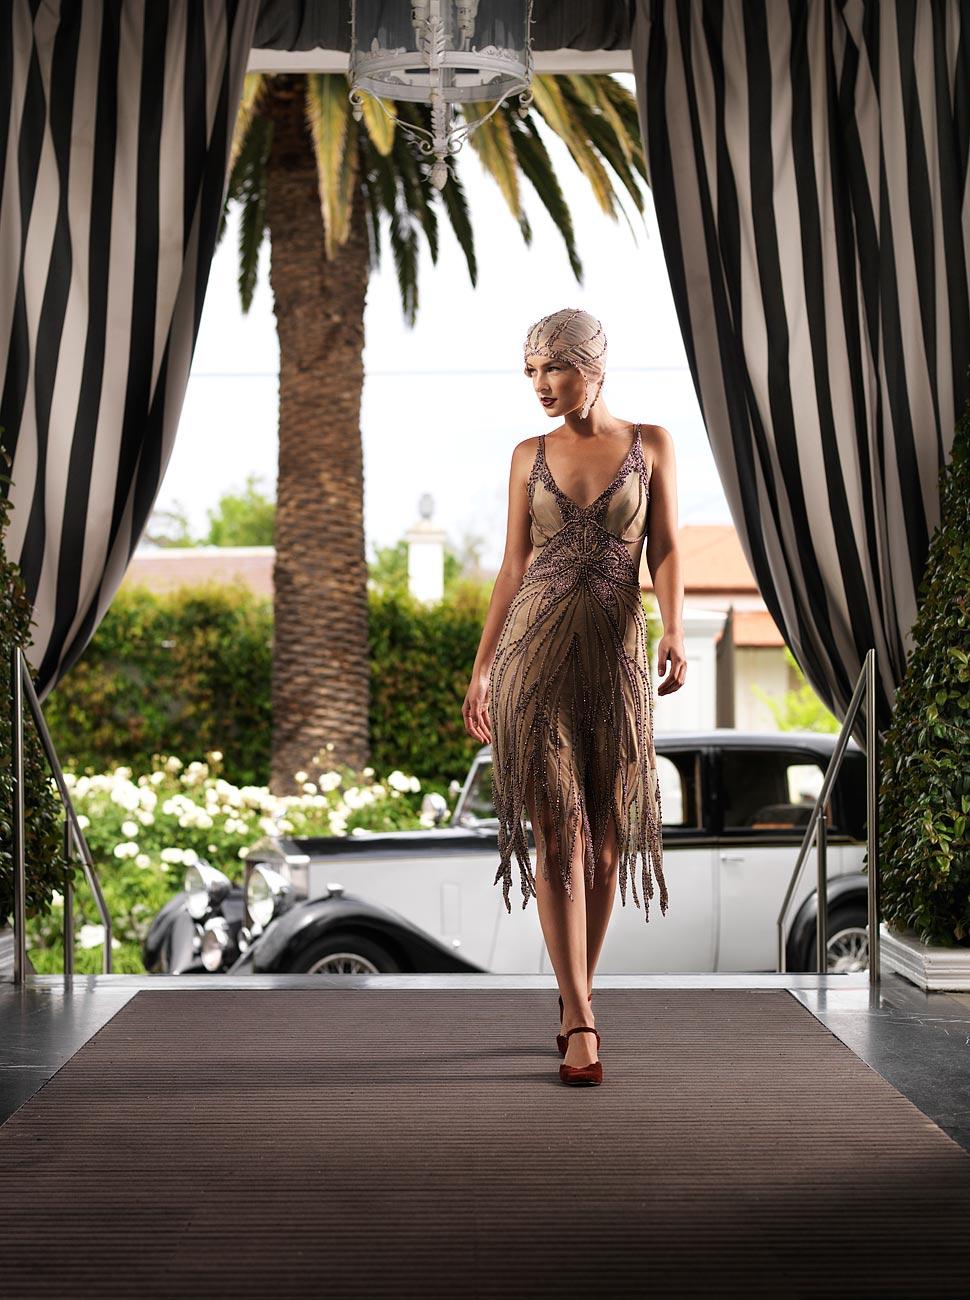 completewedding-fashion-editorial-1b.jpg